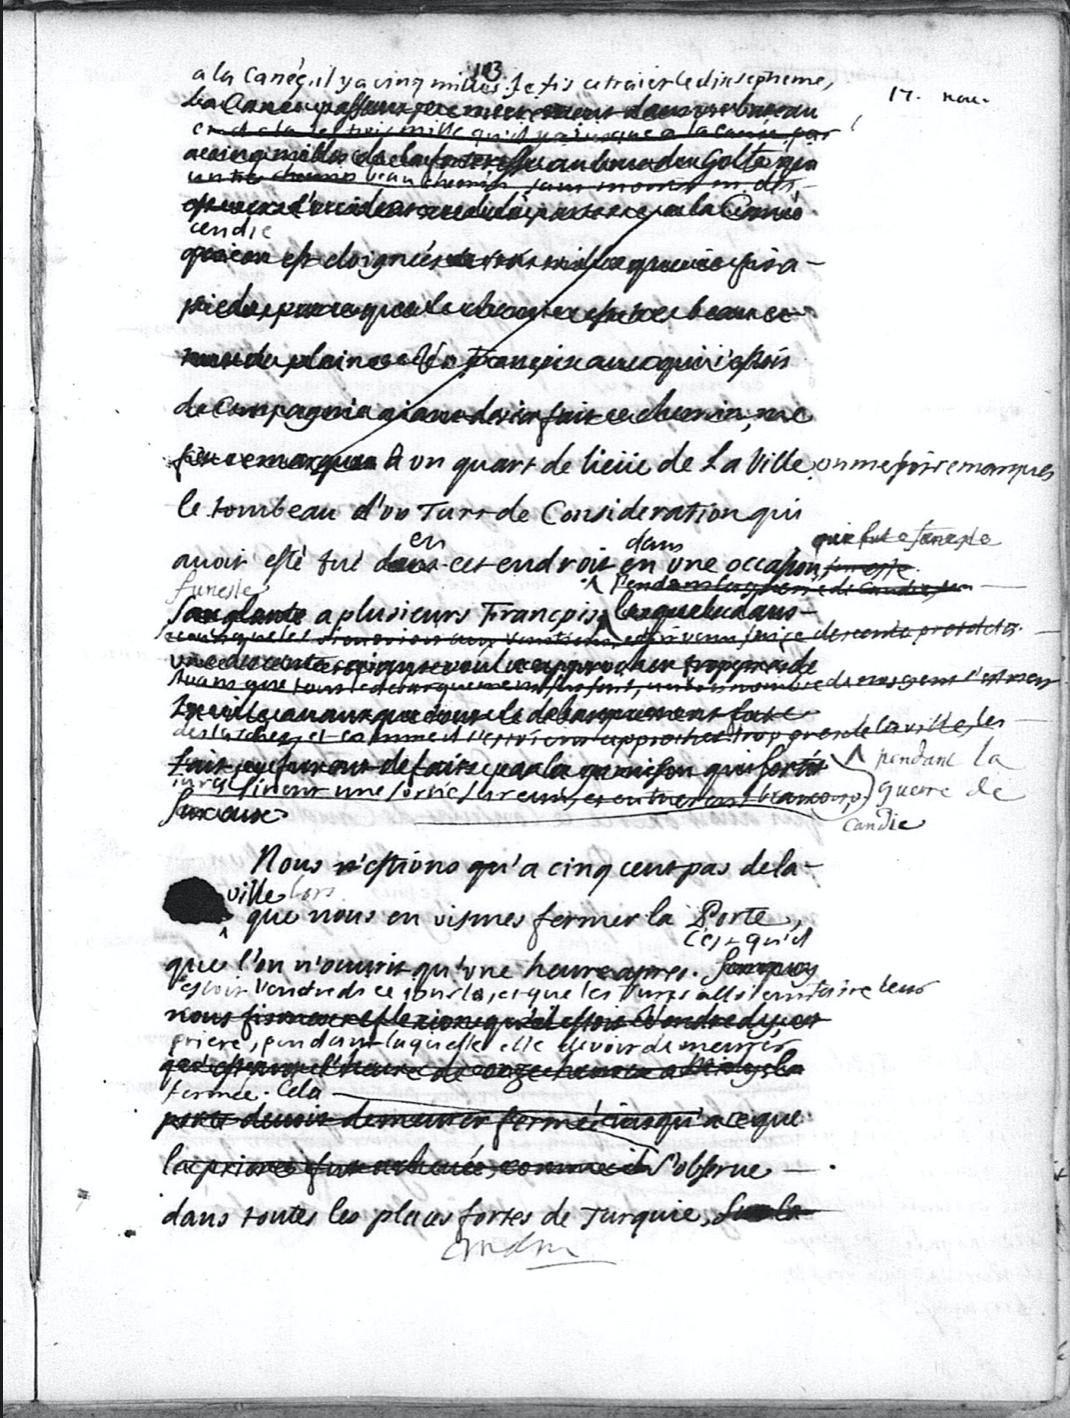 Feuillet de manuscrit de la main d'Antoine Galland